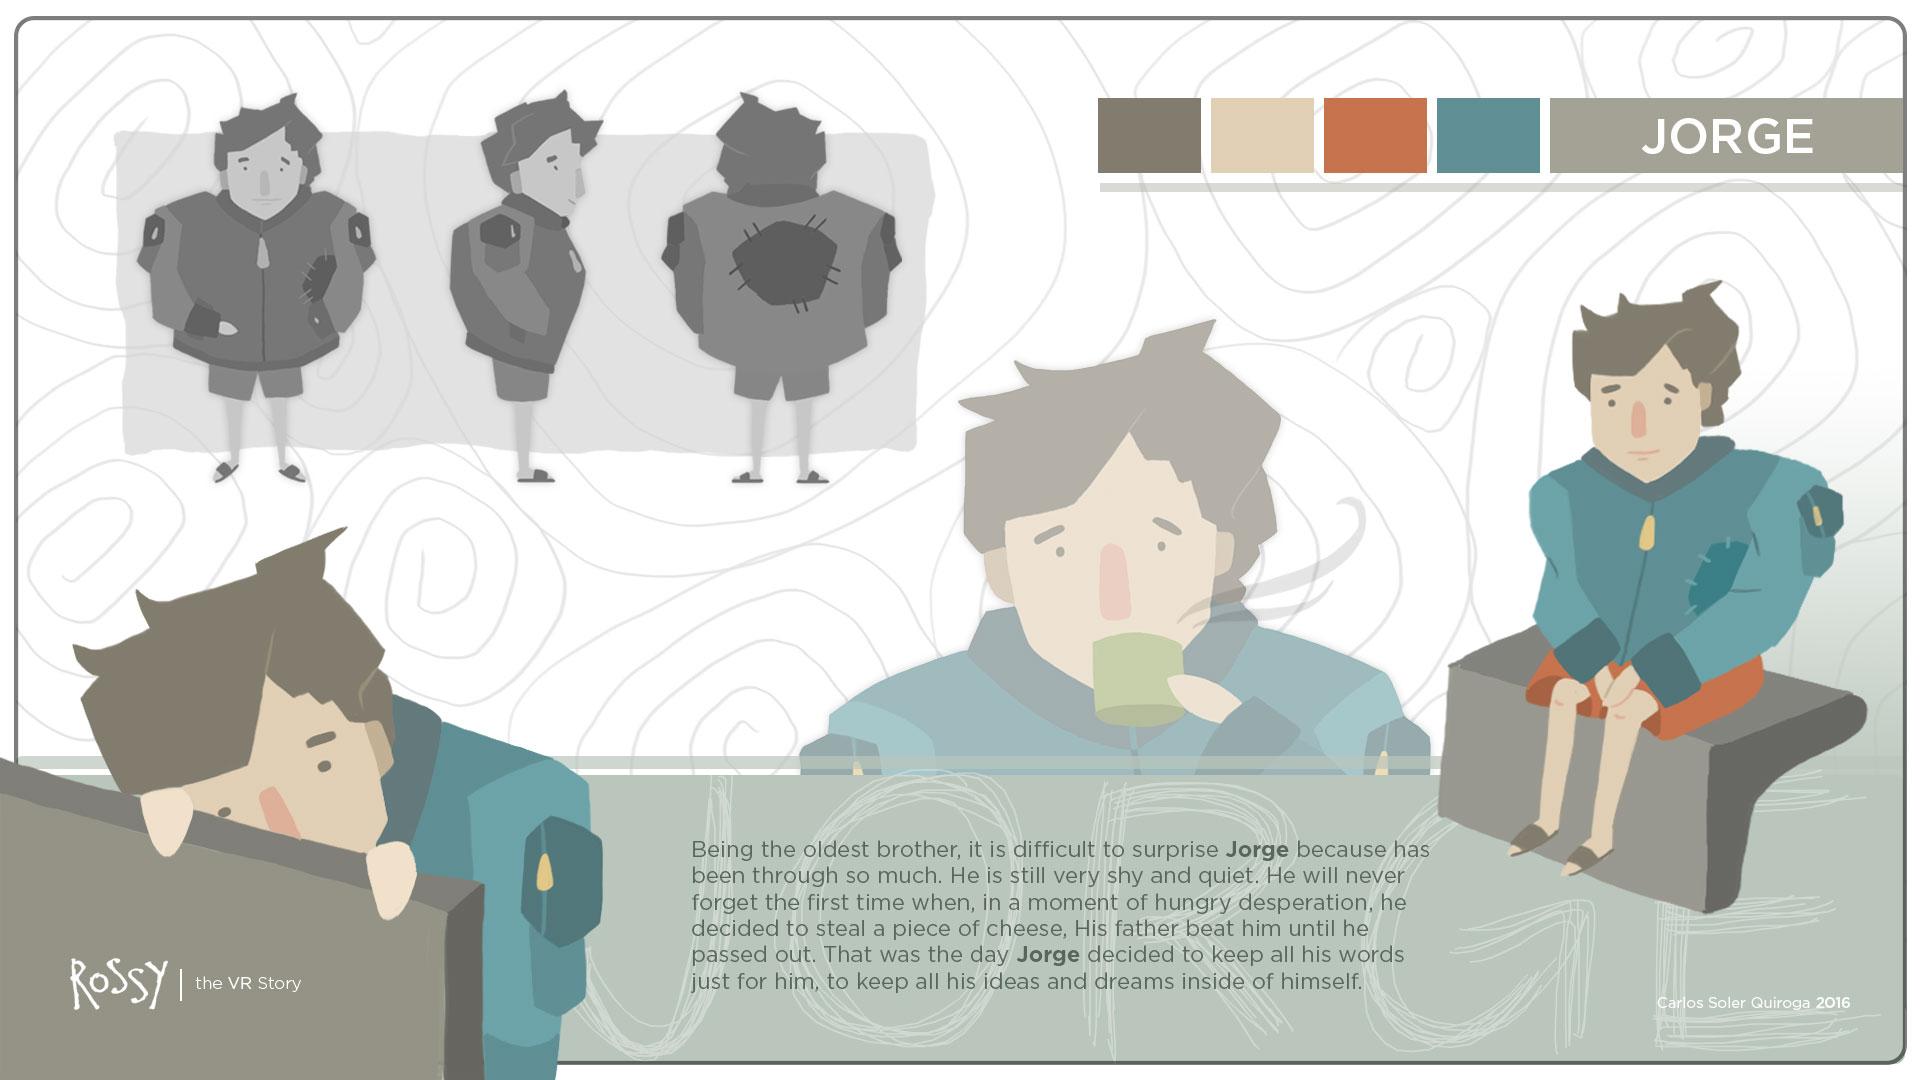 Jorge_CharacterSheet_v2.jpg